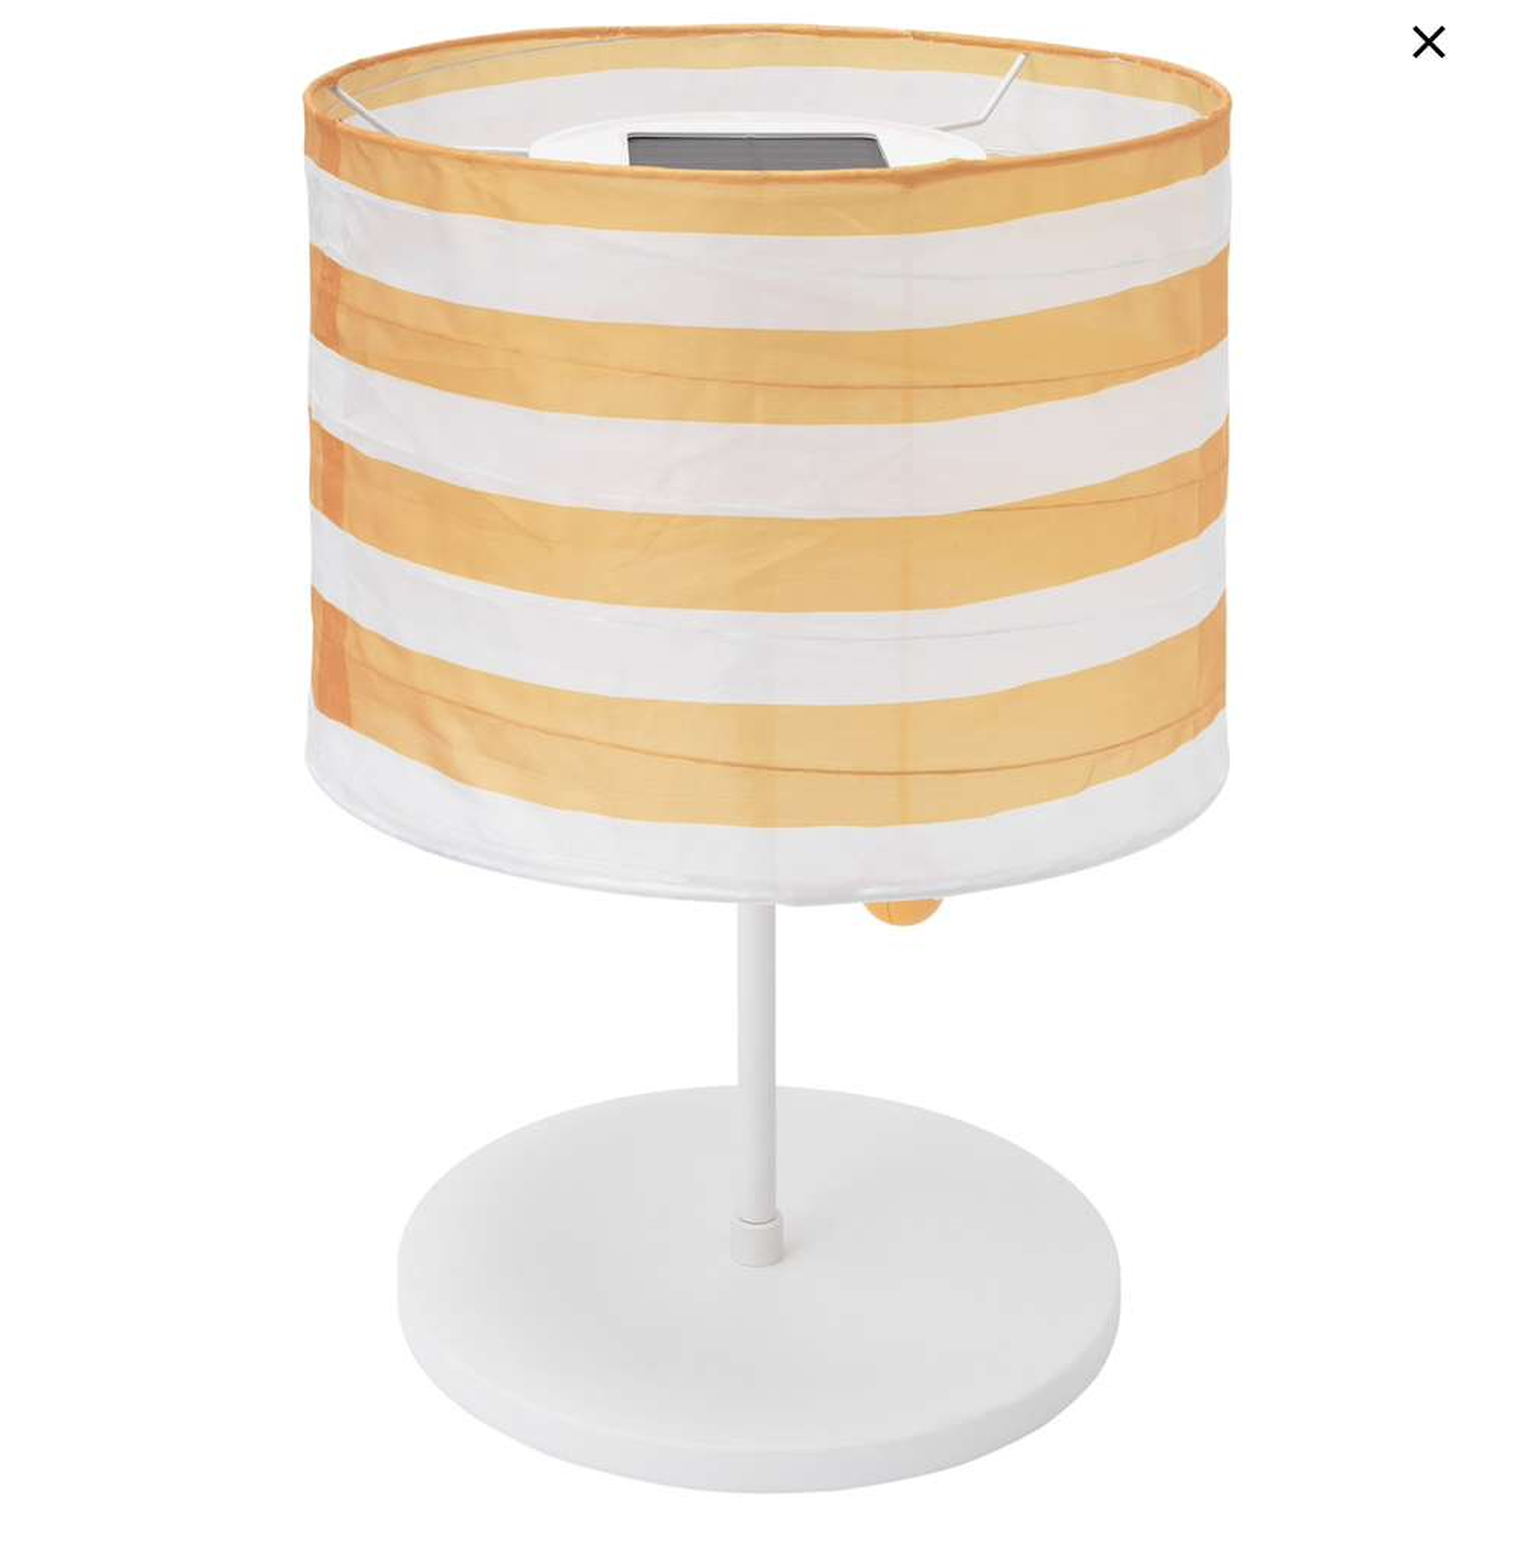 ikea berlin spandau solvinden solartischleuchte led f r drau en gestreift gelb wei. Black Bedroom Furniture Sets. Home Design Ideas